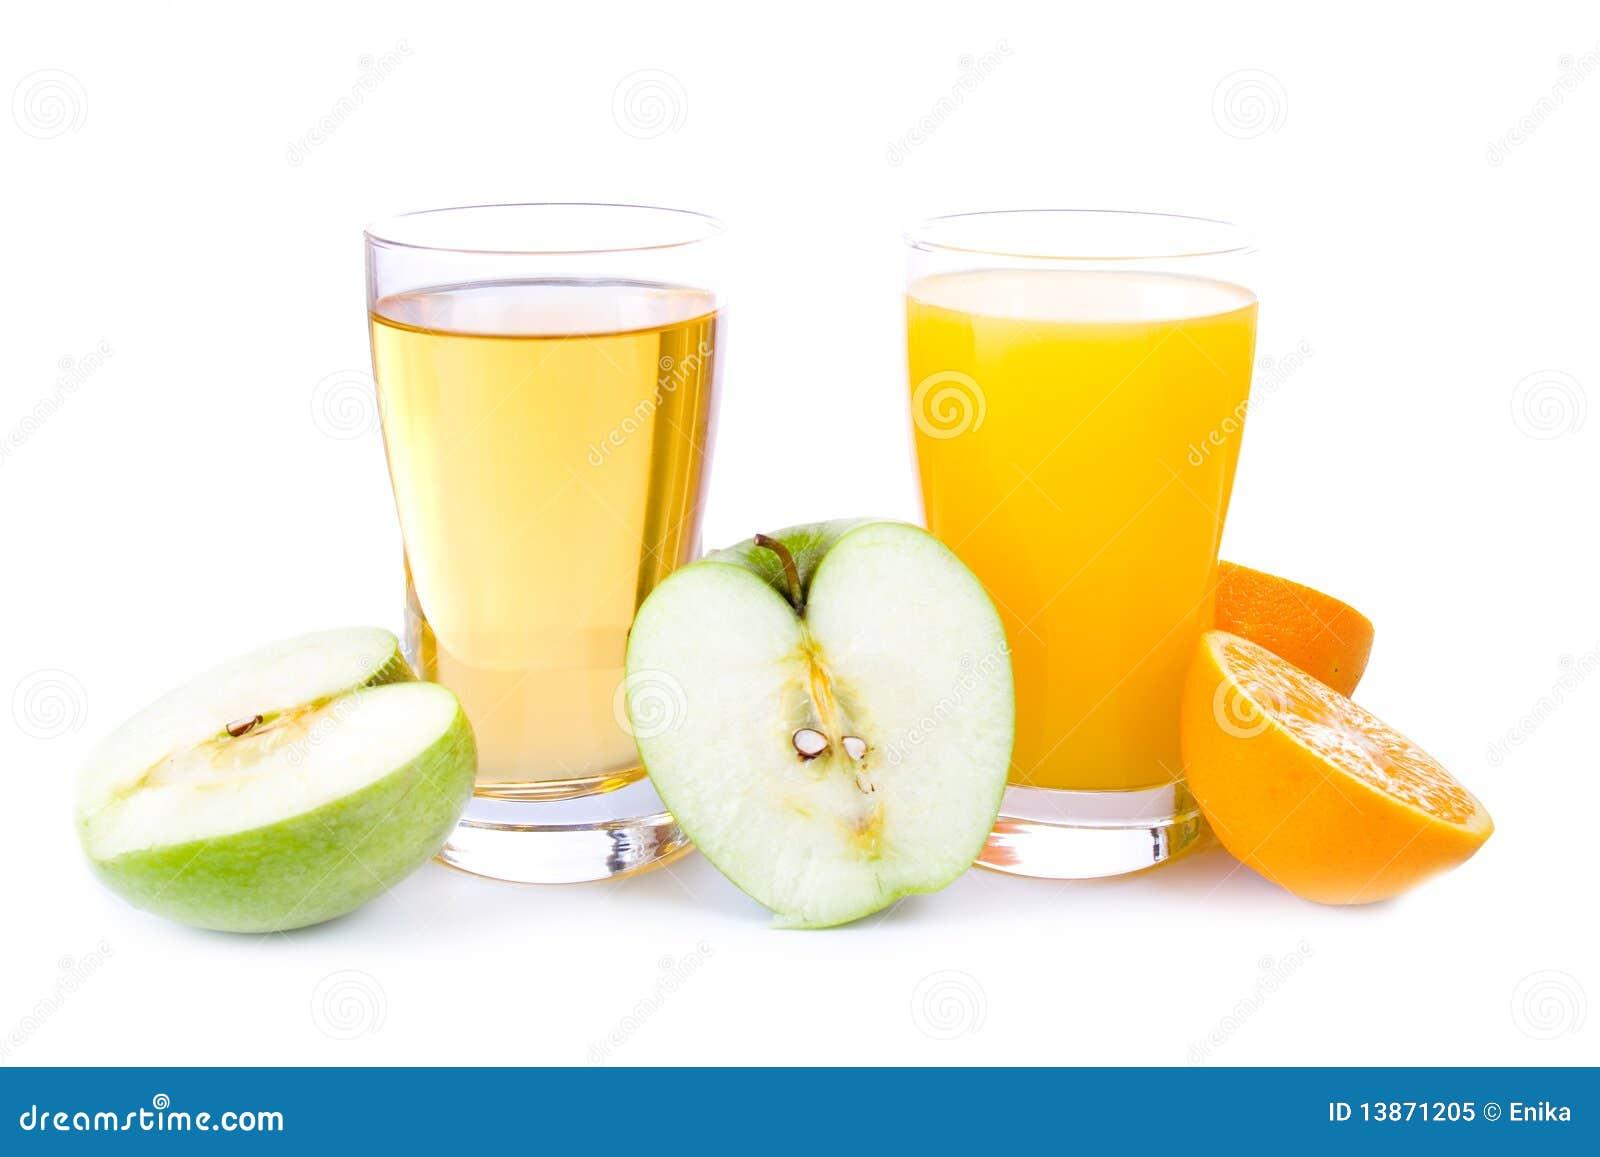 Glass Of Apple And Orange Juice Stock Image Image Of Macro Tasty 13871205